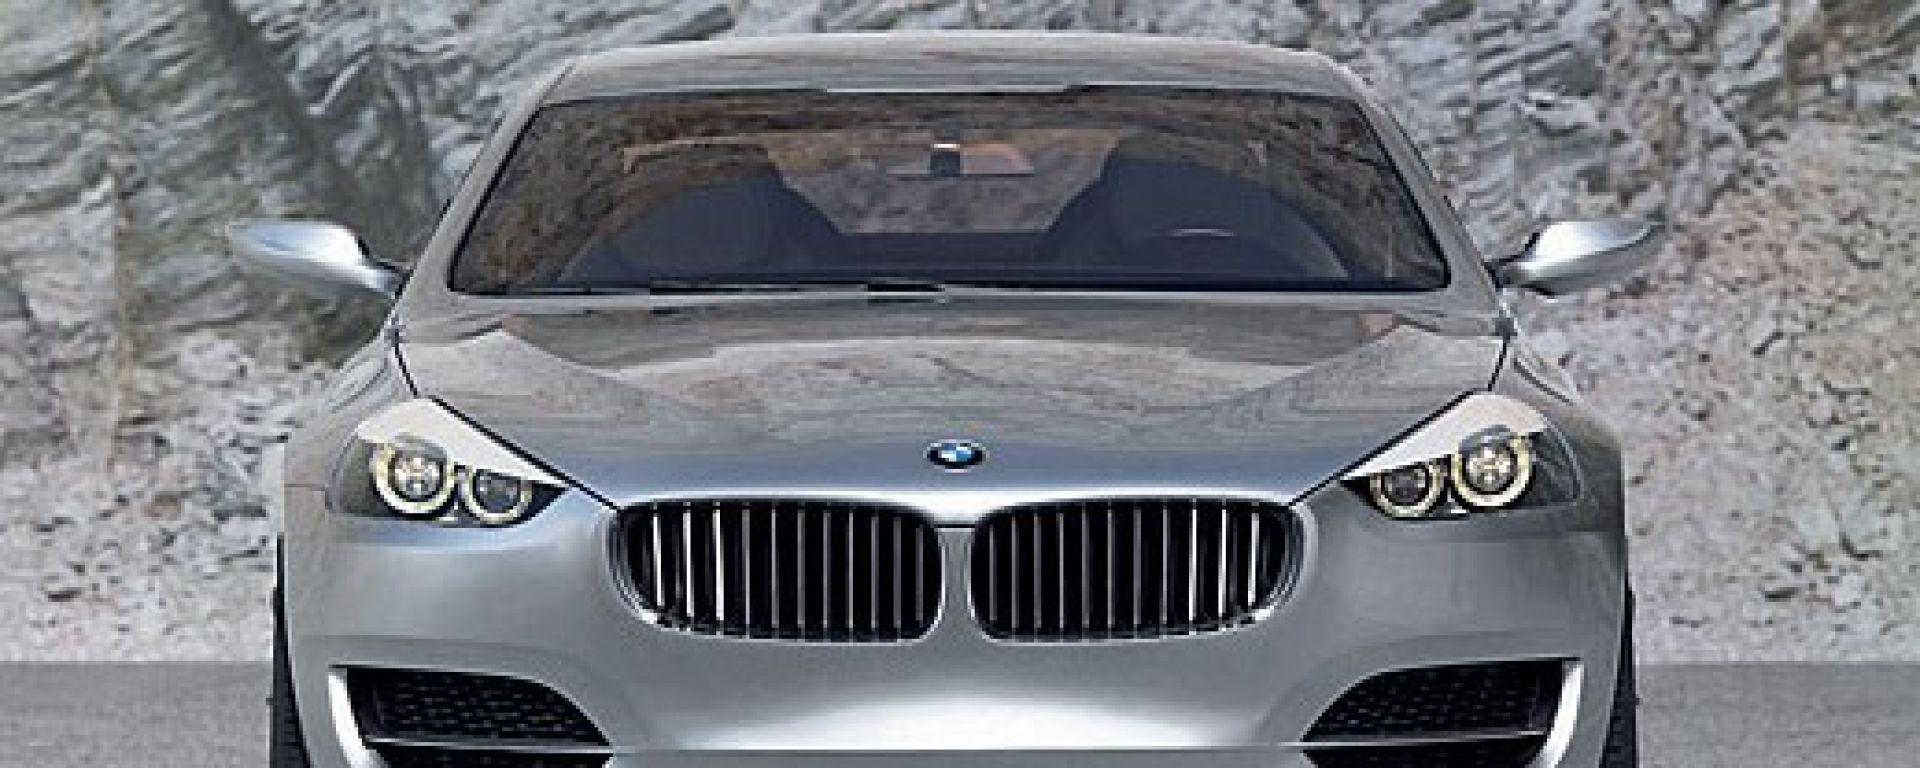 BMW CS, lo stil novo di Monaco